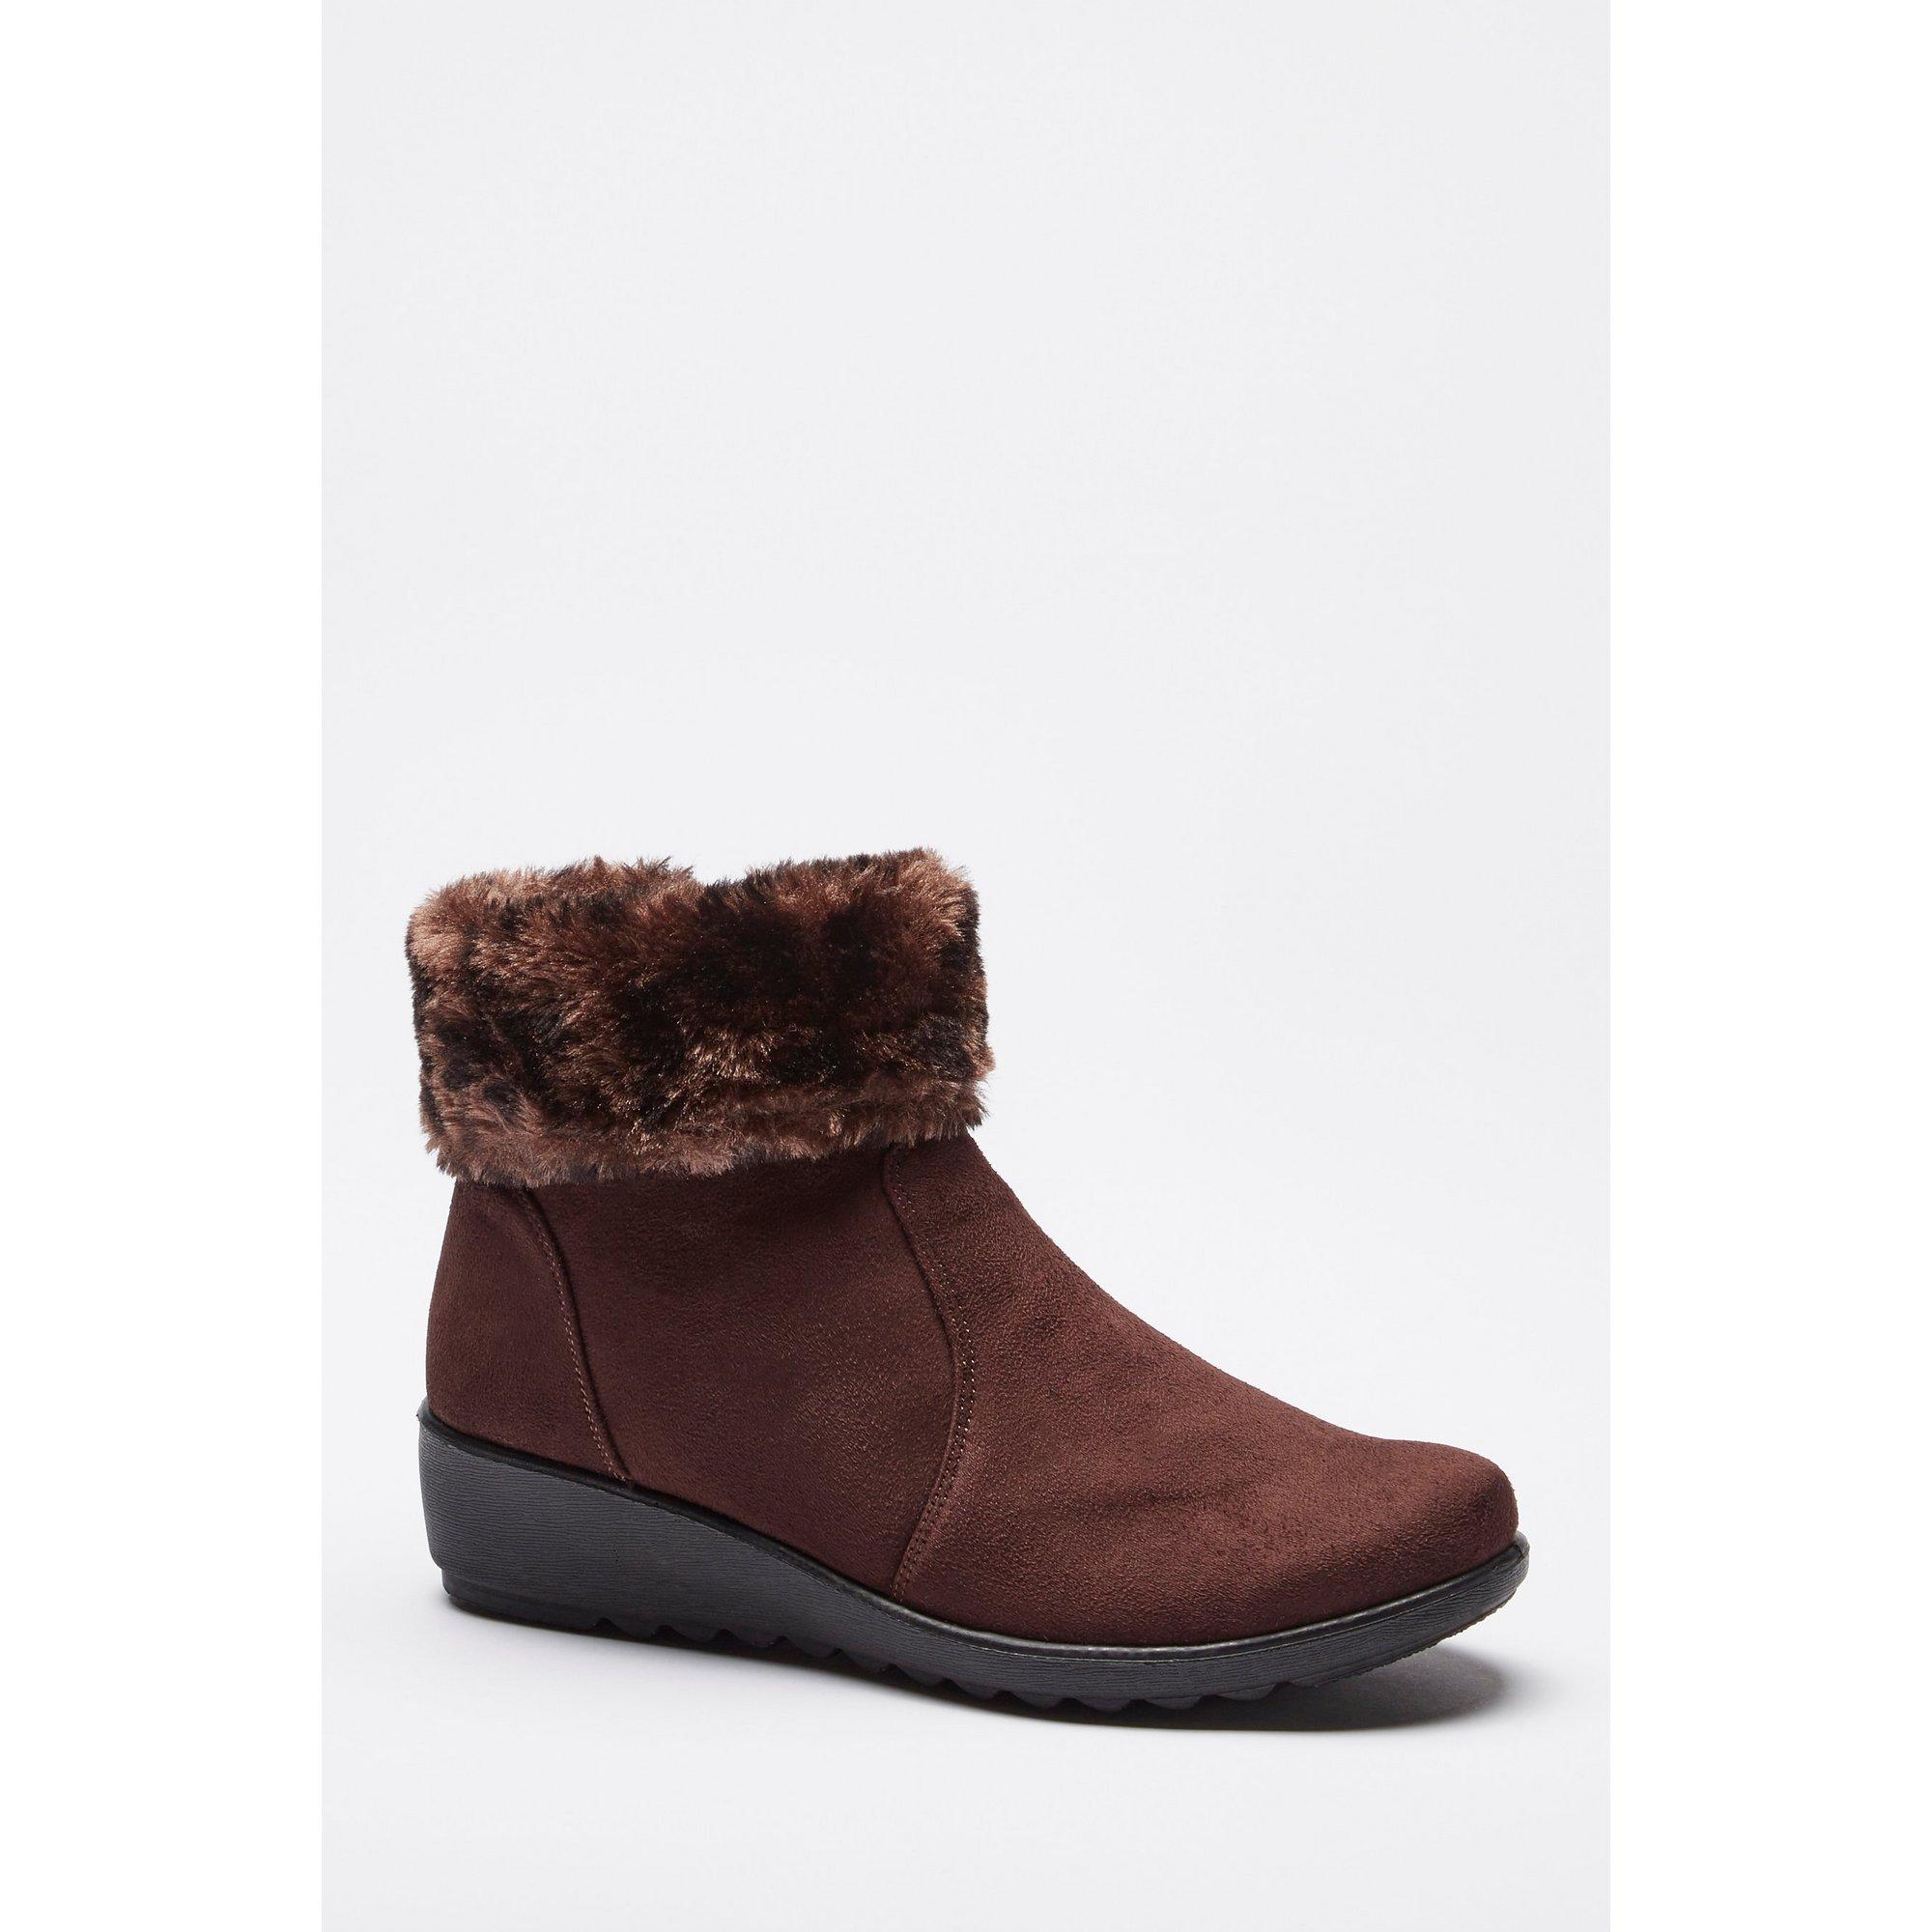 Image of Cushion Walk Animal Faux Fur Brown Boots